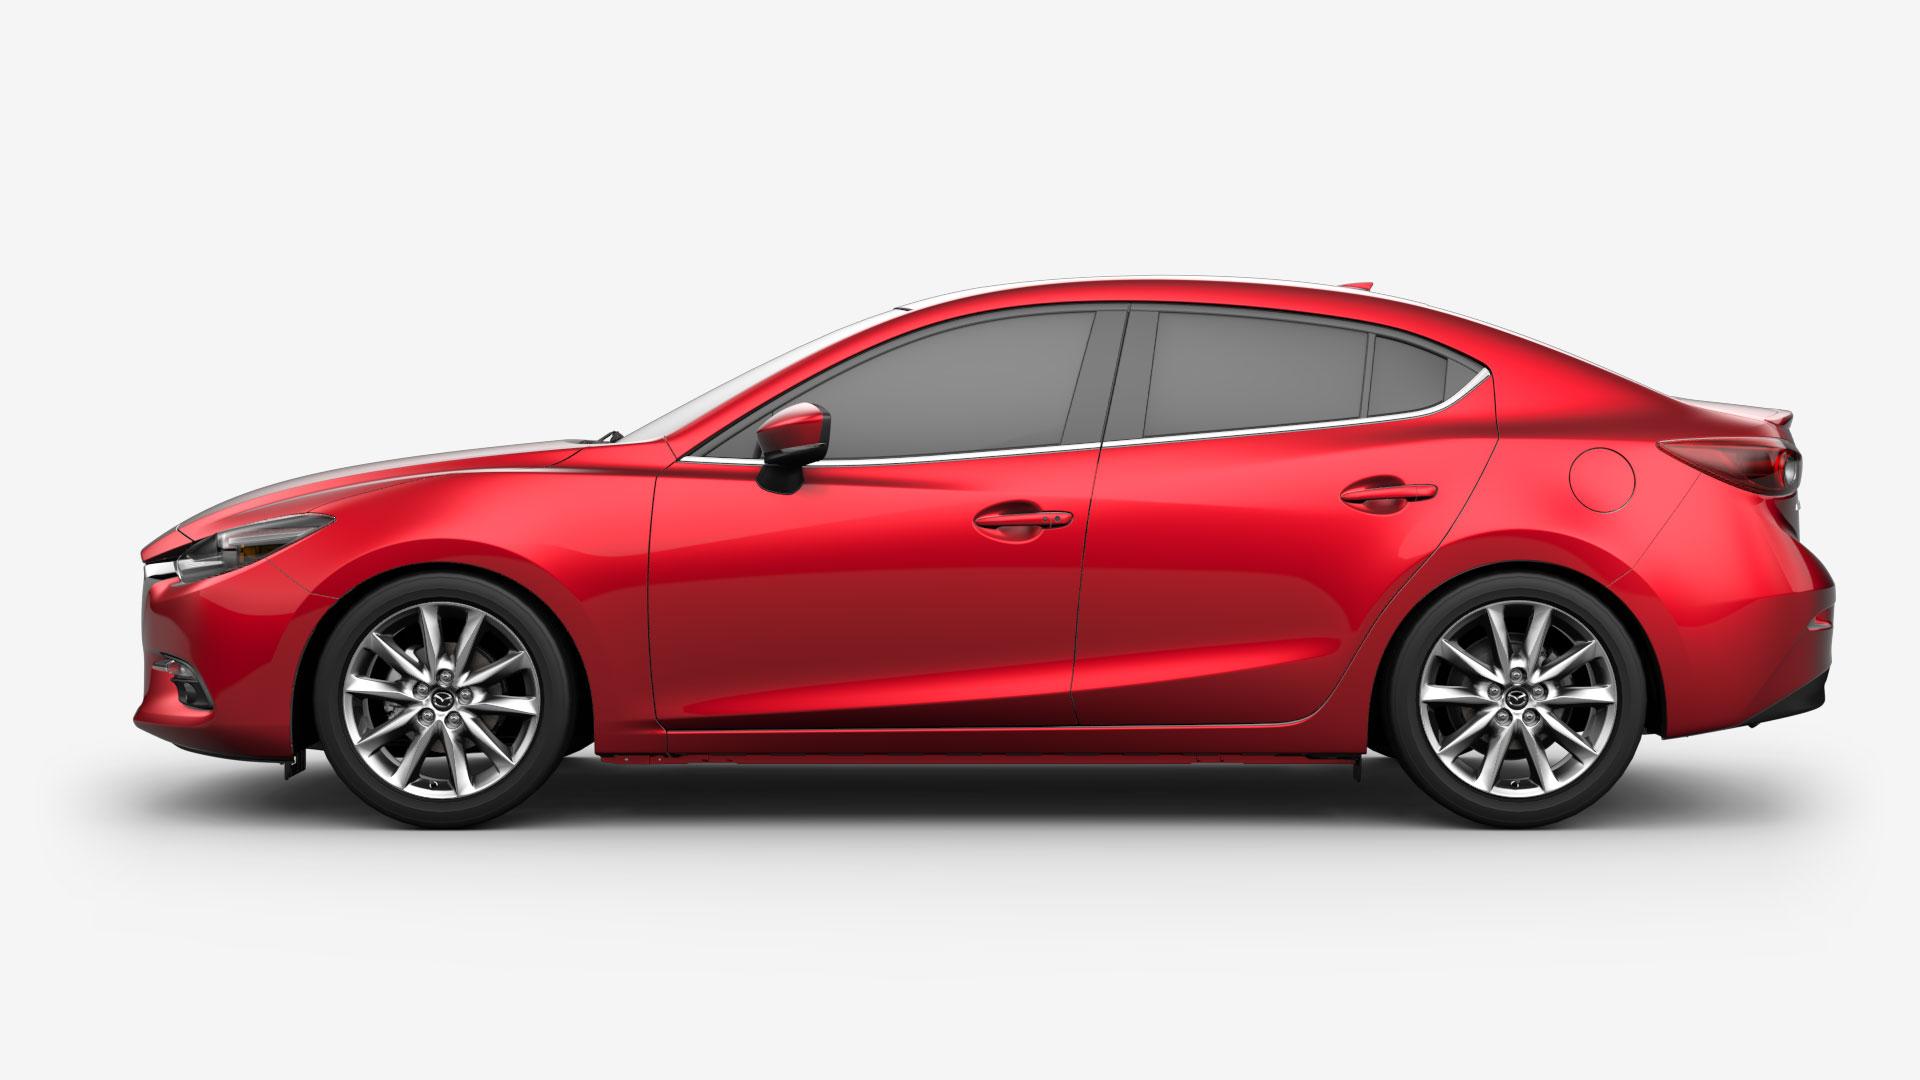 2018 mazda 3 sedan fuel efficient compact car mazda usa rh mazdausa com Mazda Perkins Diesel Mazda 6 Diesel Us